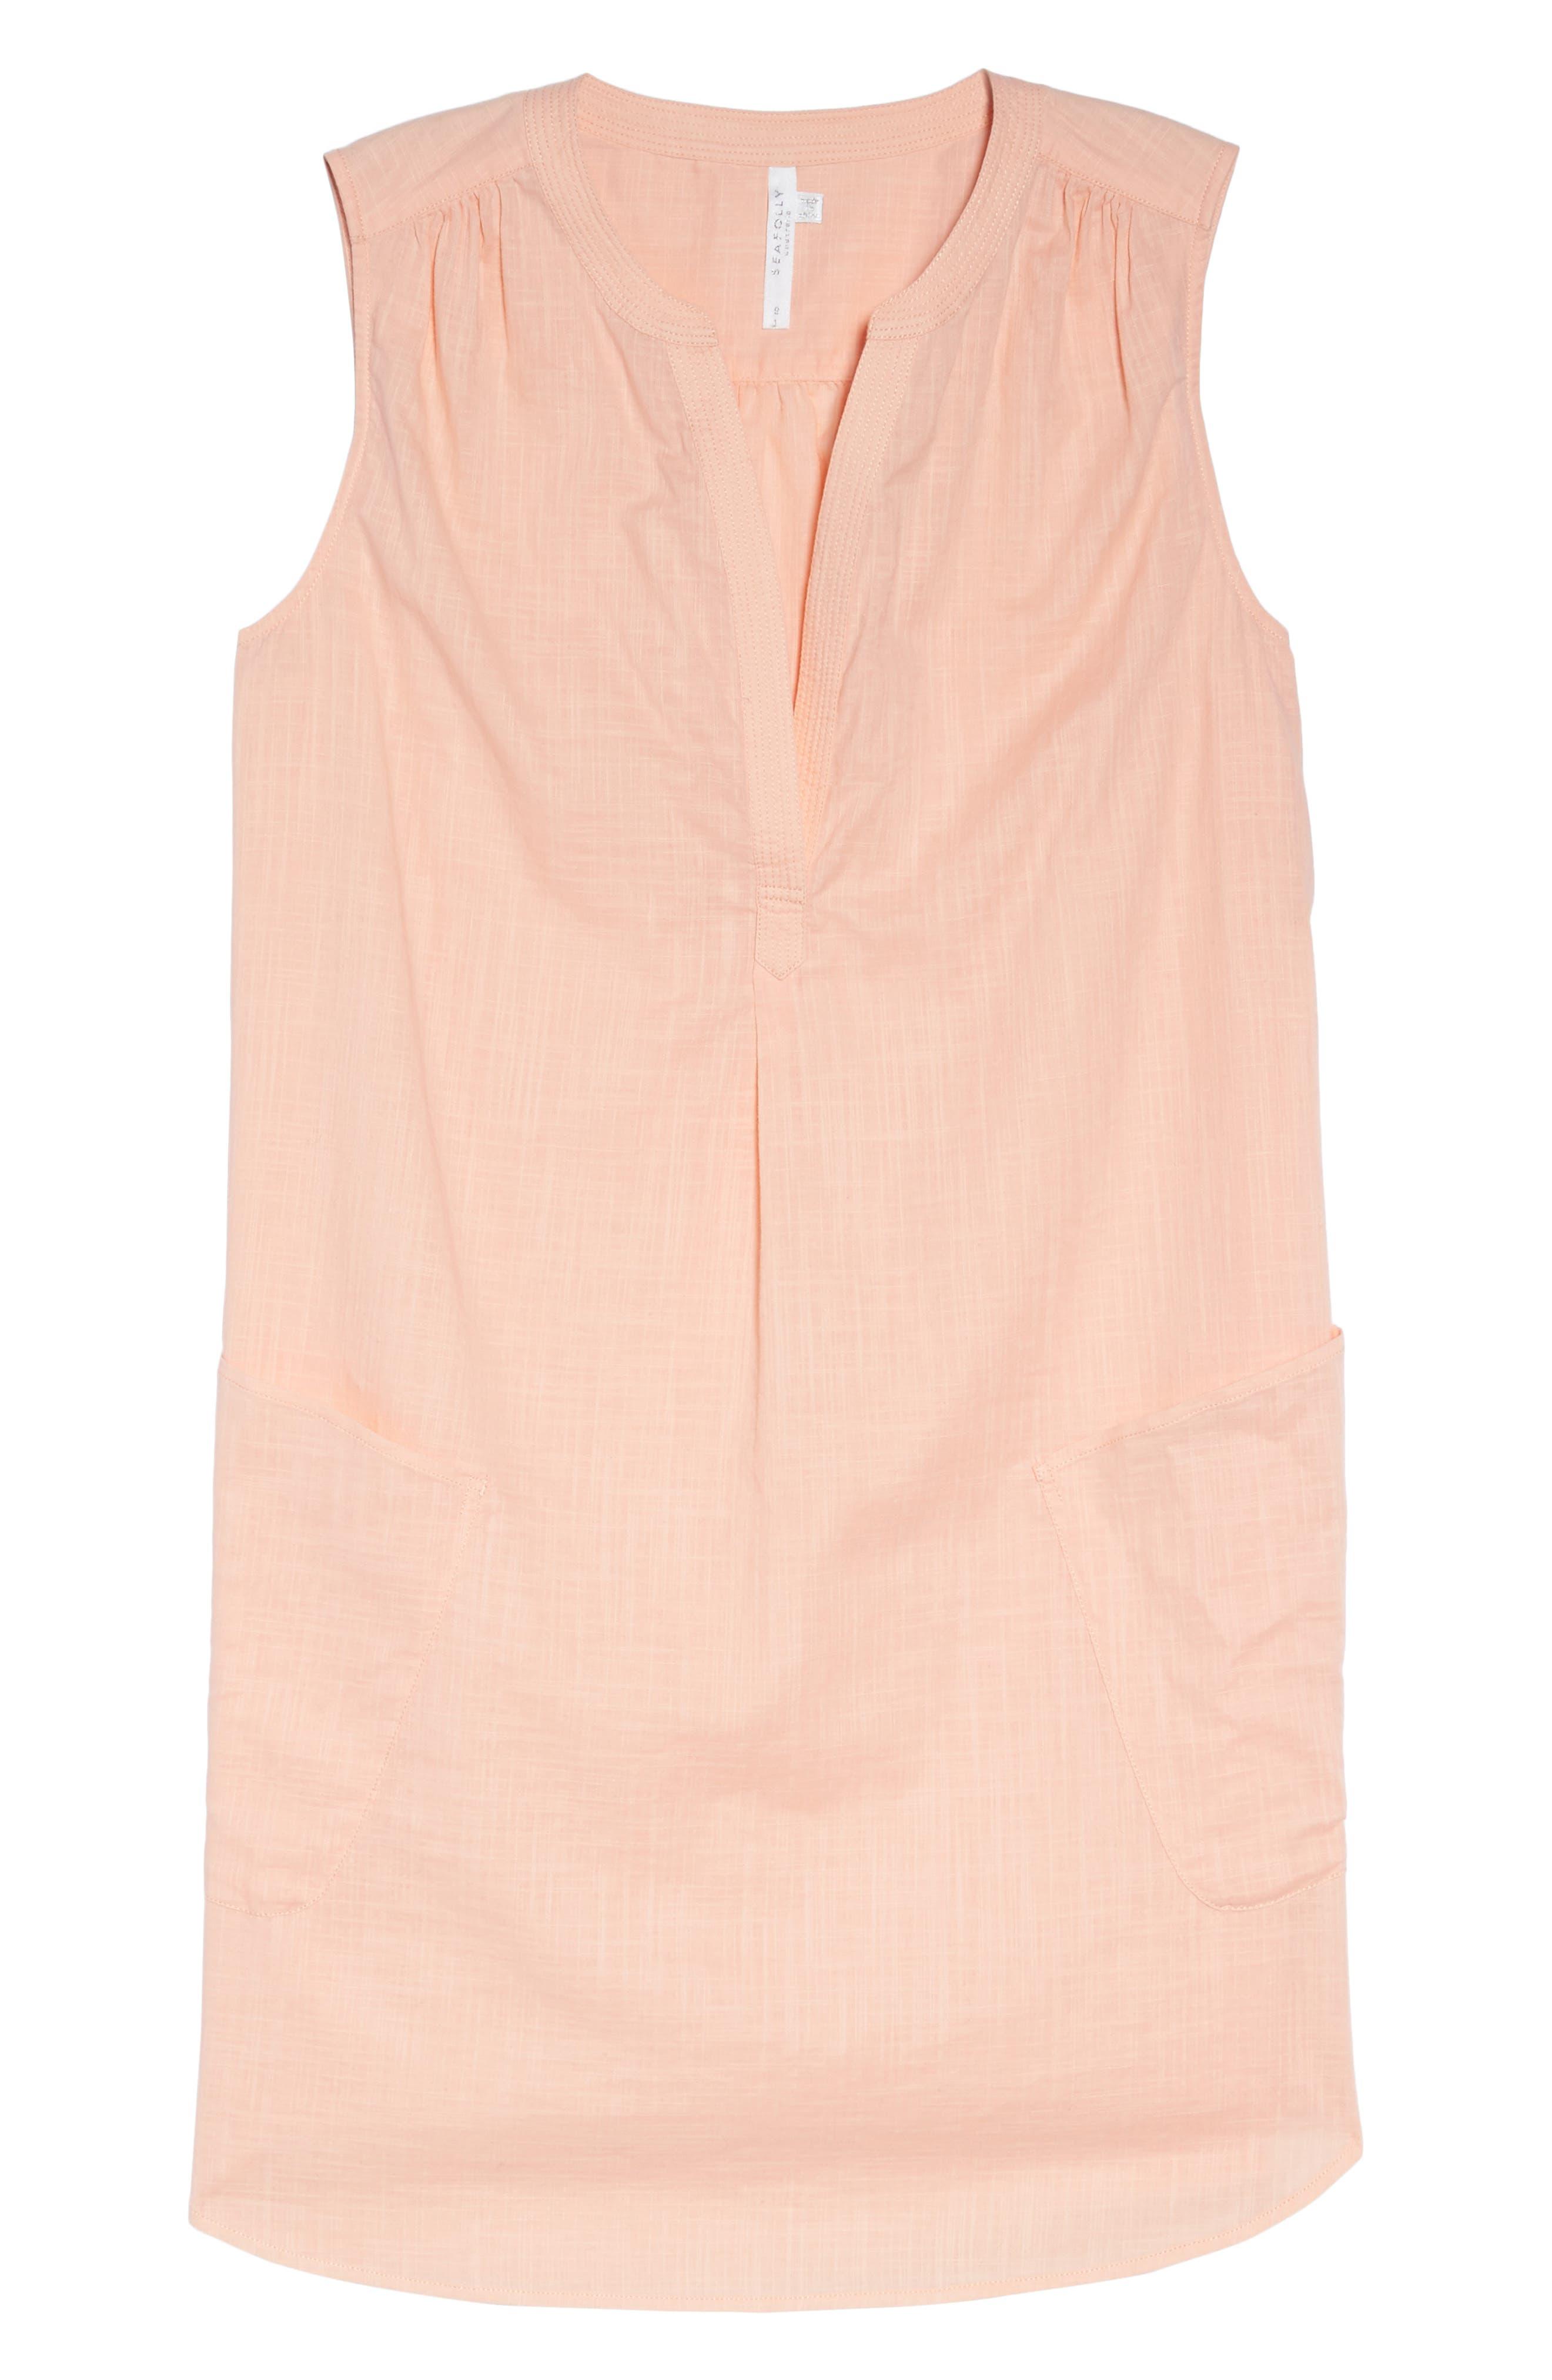 Palm Beach Cover-Up Dress,                             Alternate thumbnail 6, color,                             Peach Melba